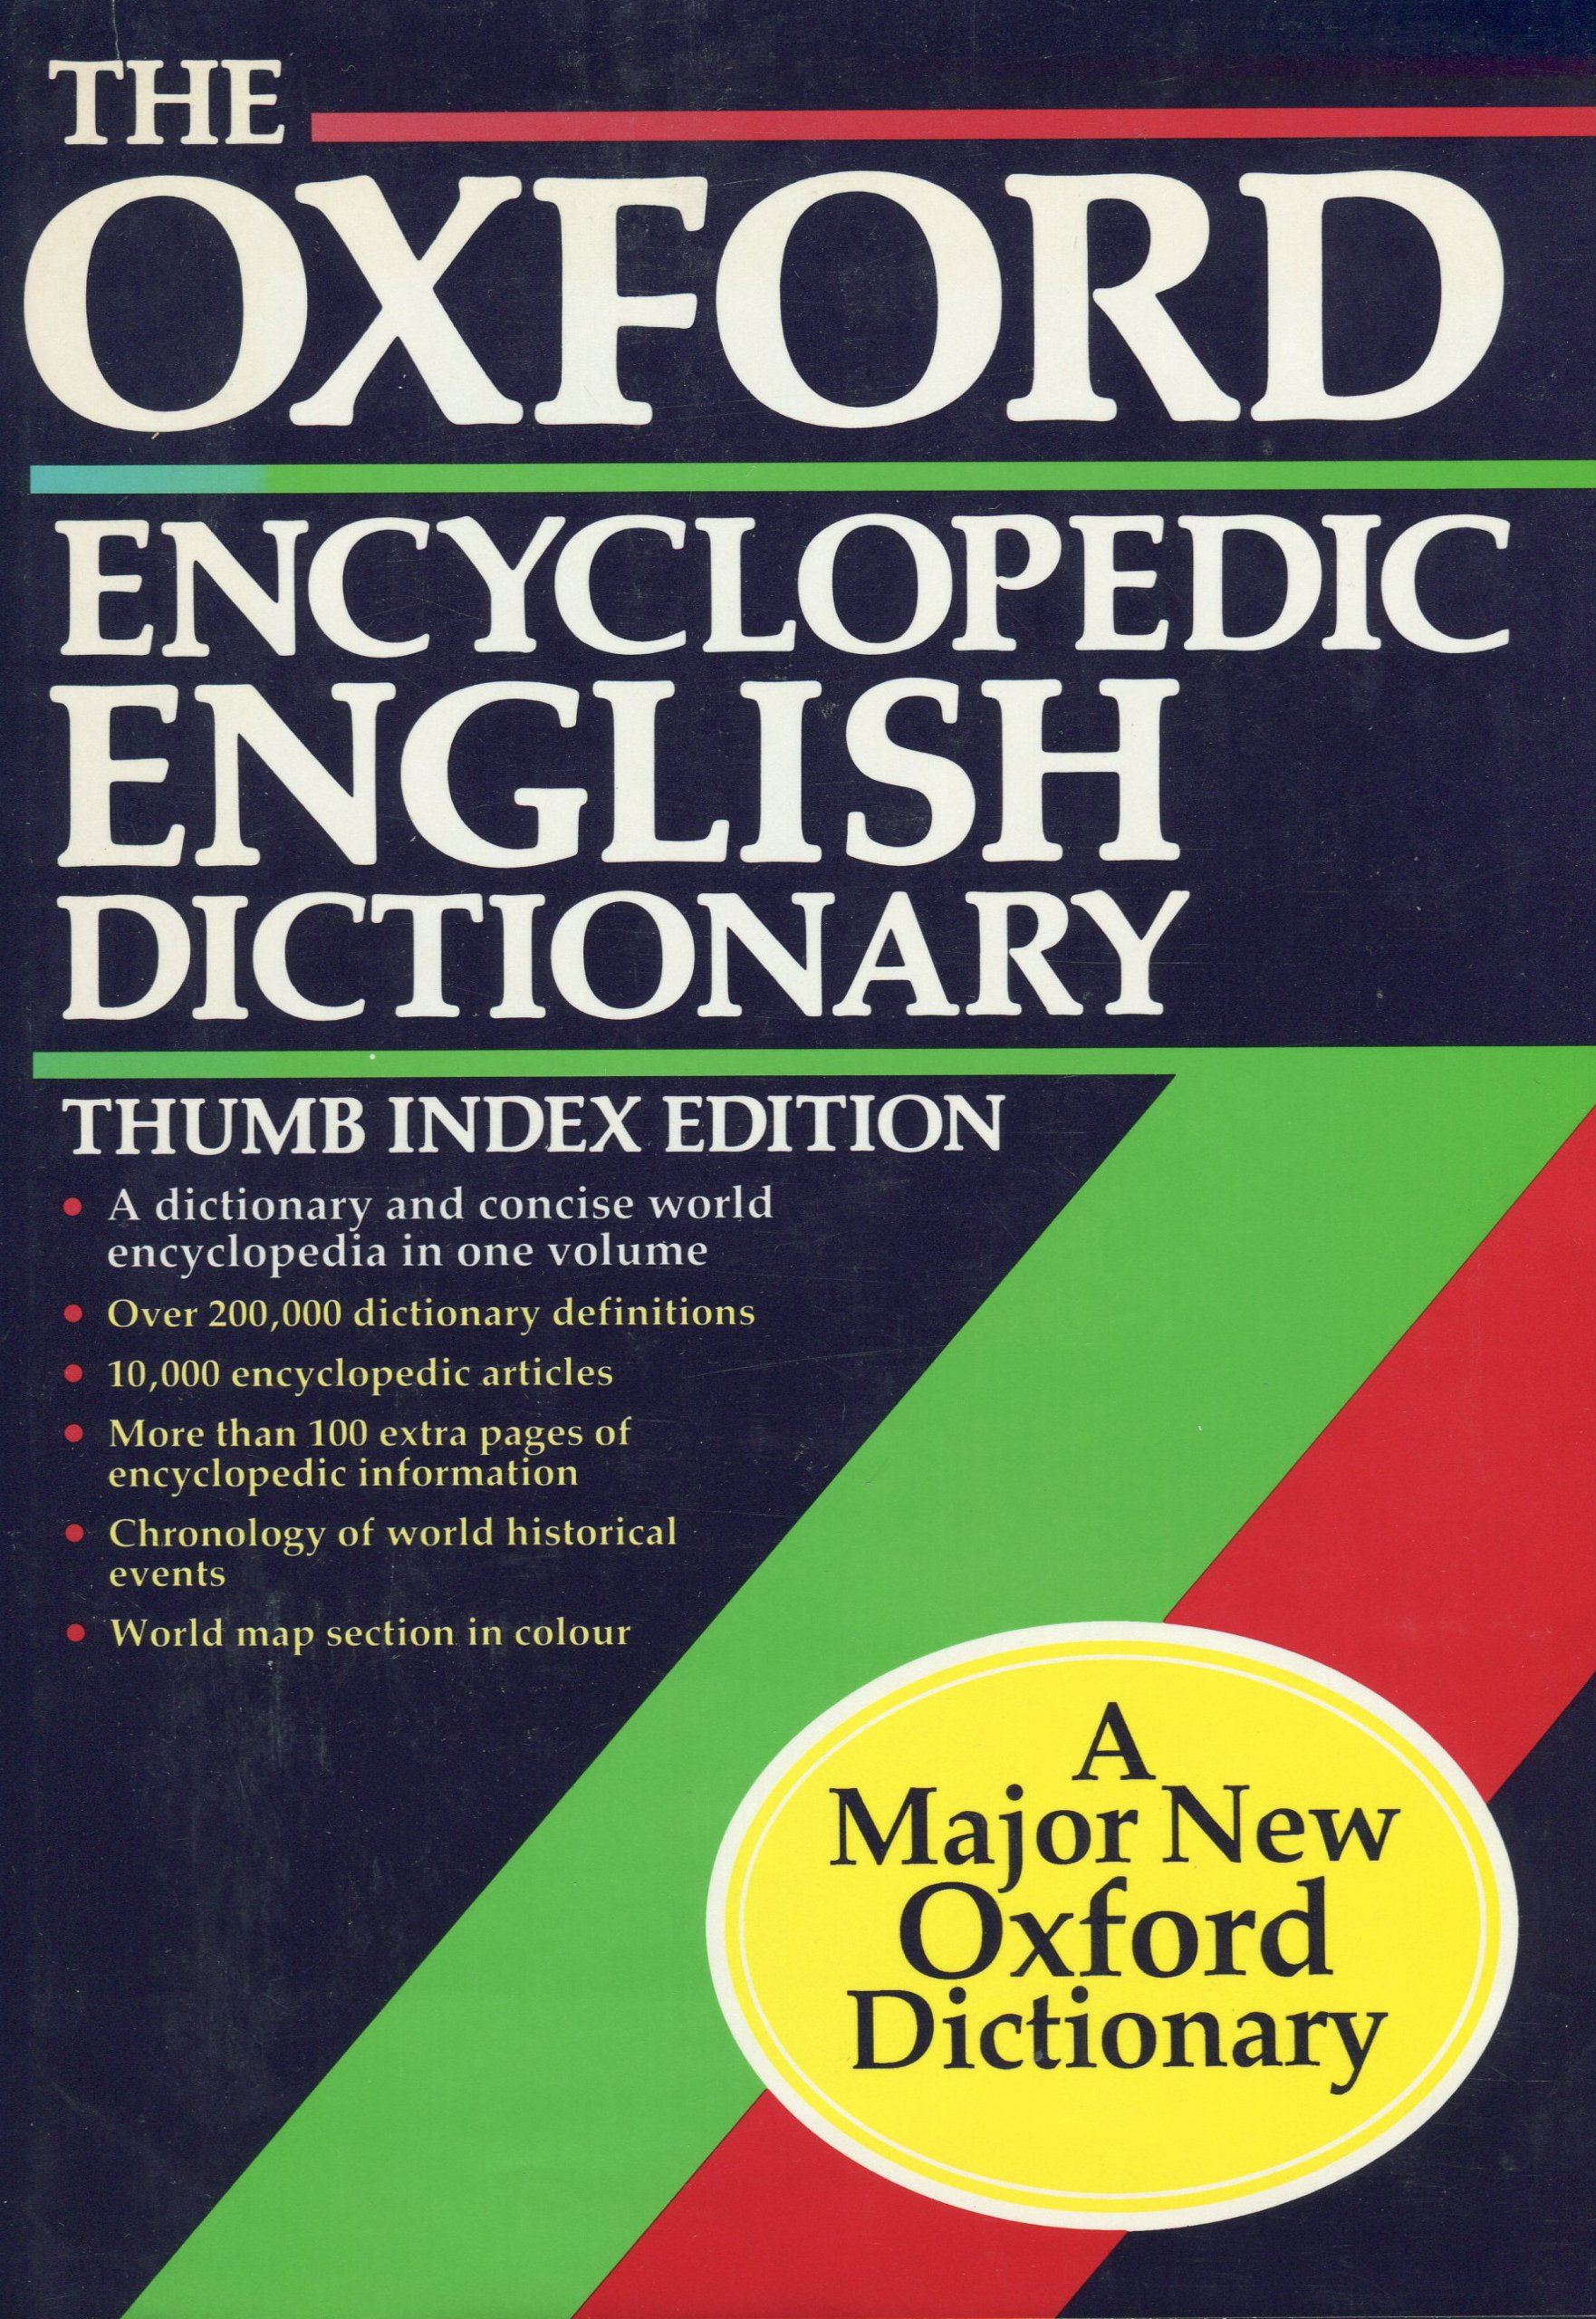 Amazon.com: The Oxford Encyclopedic English Dictionary: with thumb index  (9780198612667): Joyce M. Hawkins, Robert Allen: Books